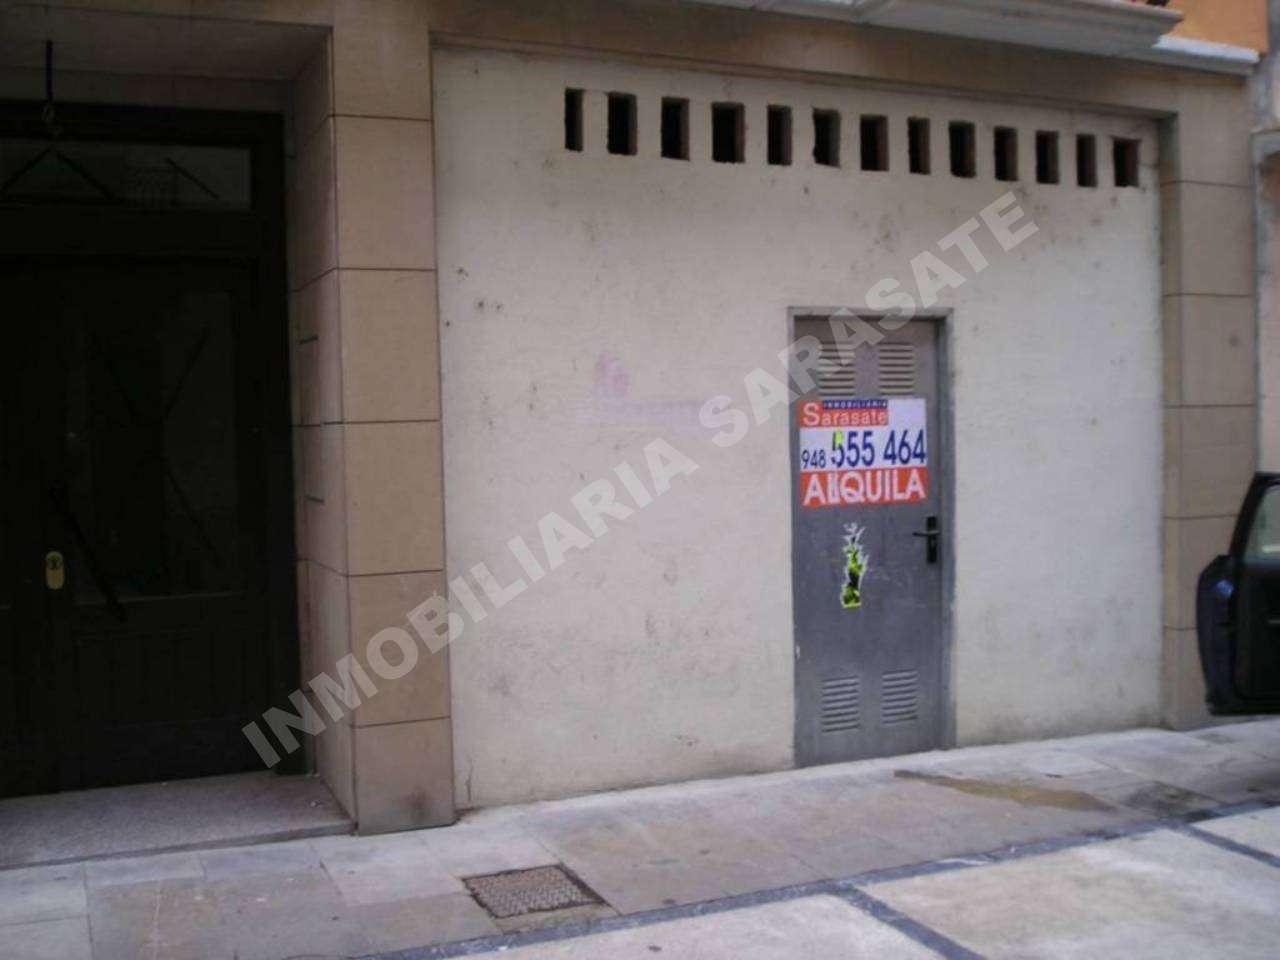 ALQUILER DE LOCAL EN CALLE CARPINTERíA, ESTELLA-LIZARRA | REF. (000696)